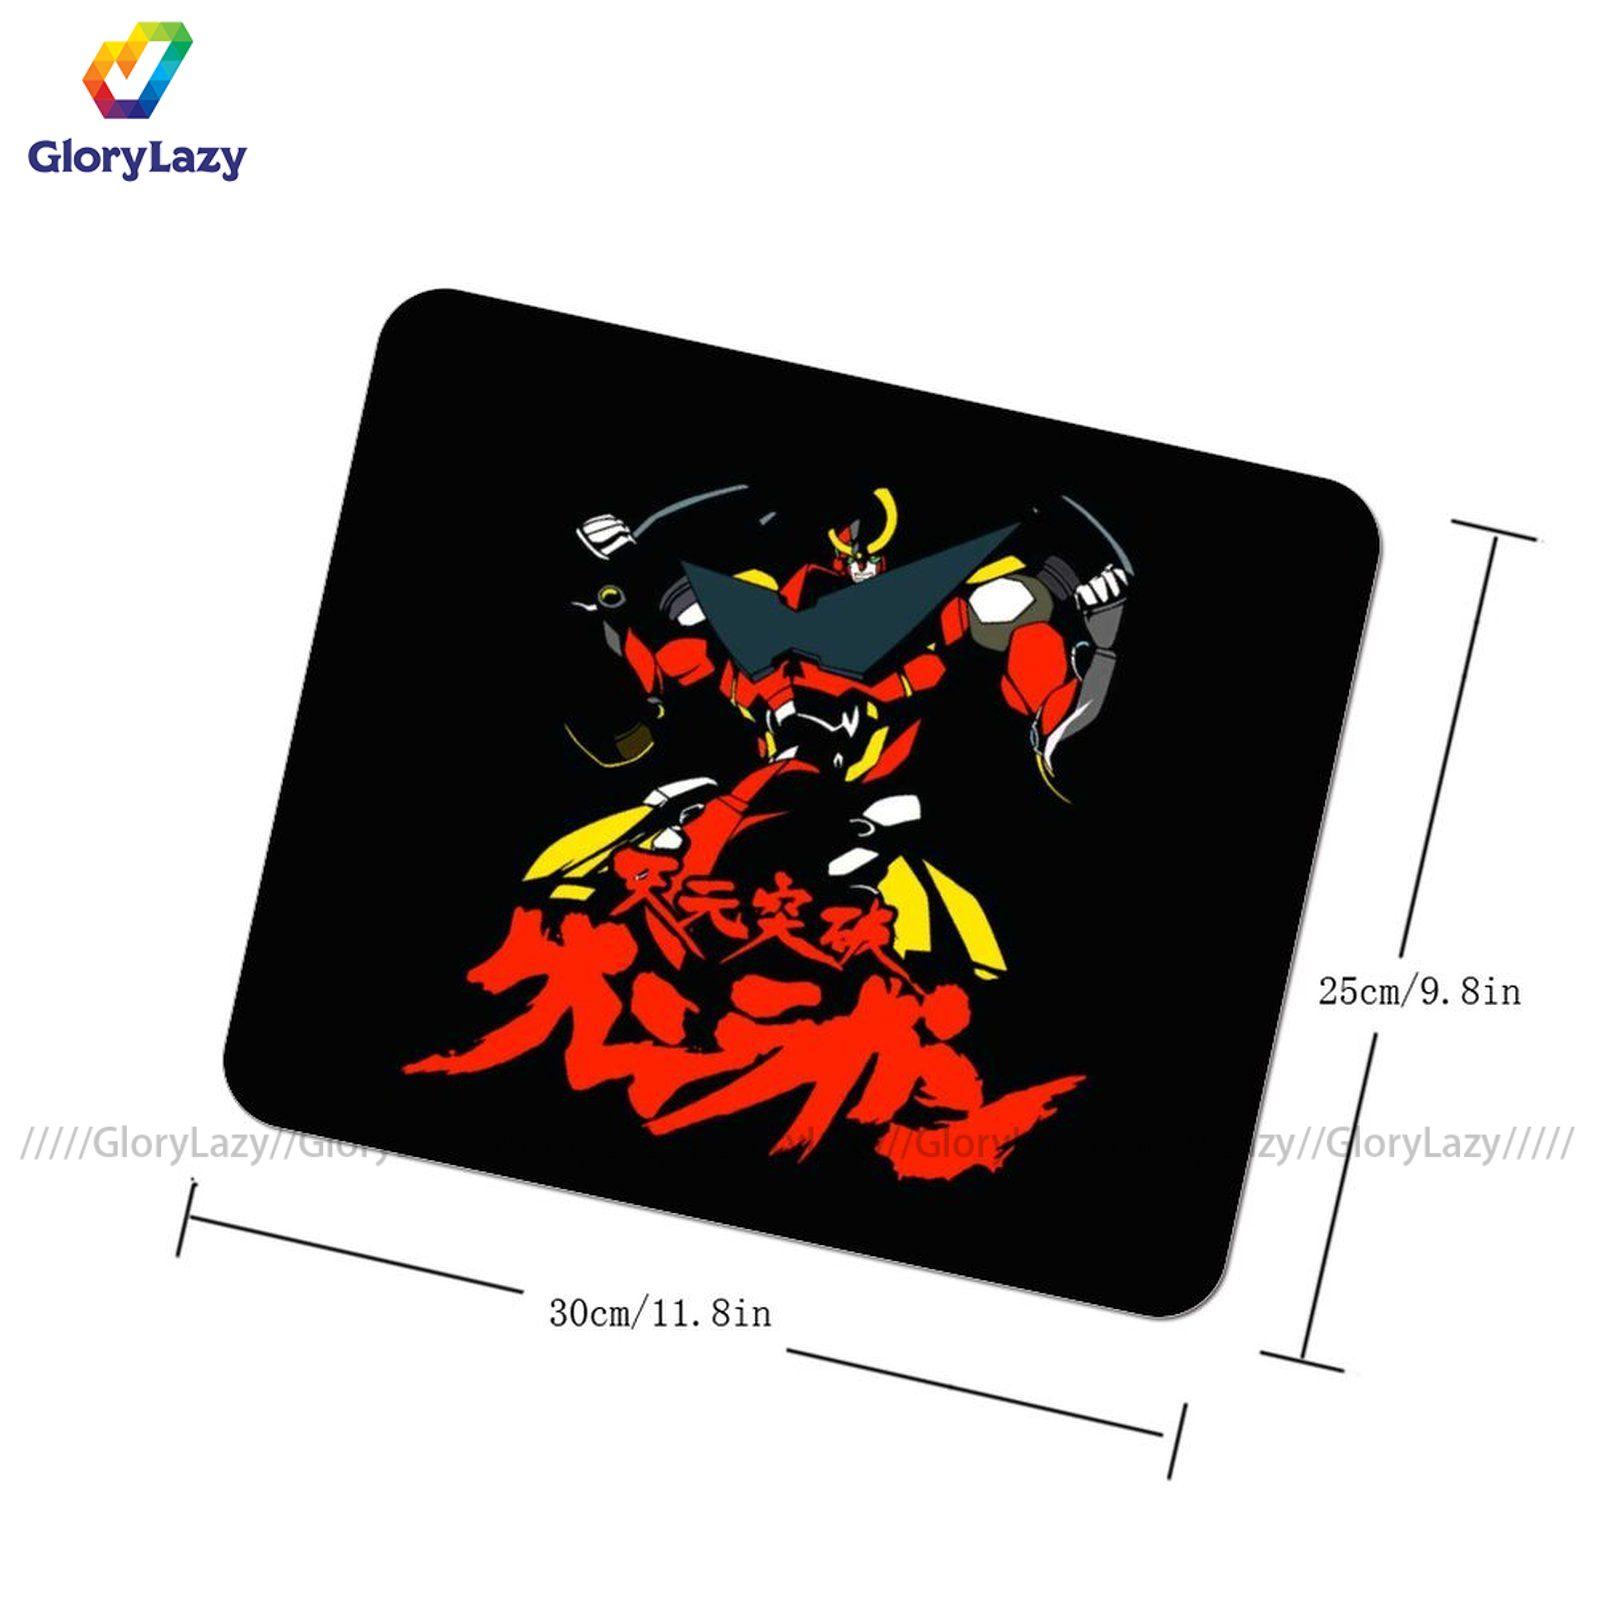 H2cd57aa88b294e1e89ce59d3a7befed6p - Anime Mousepads